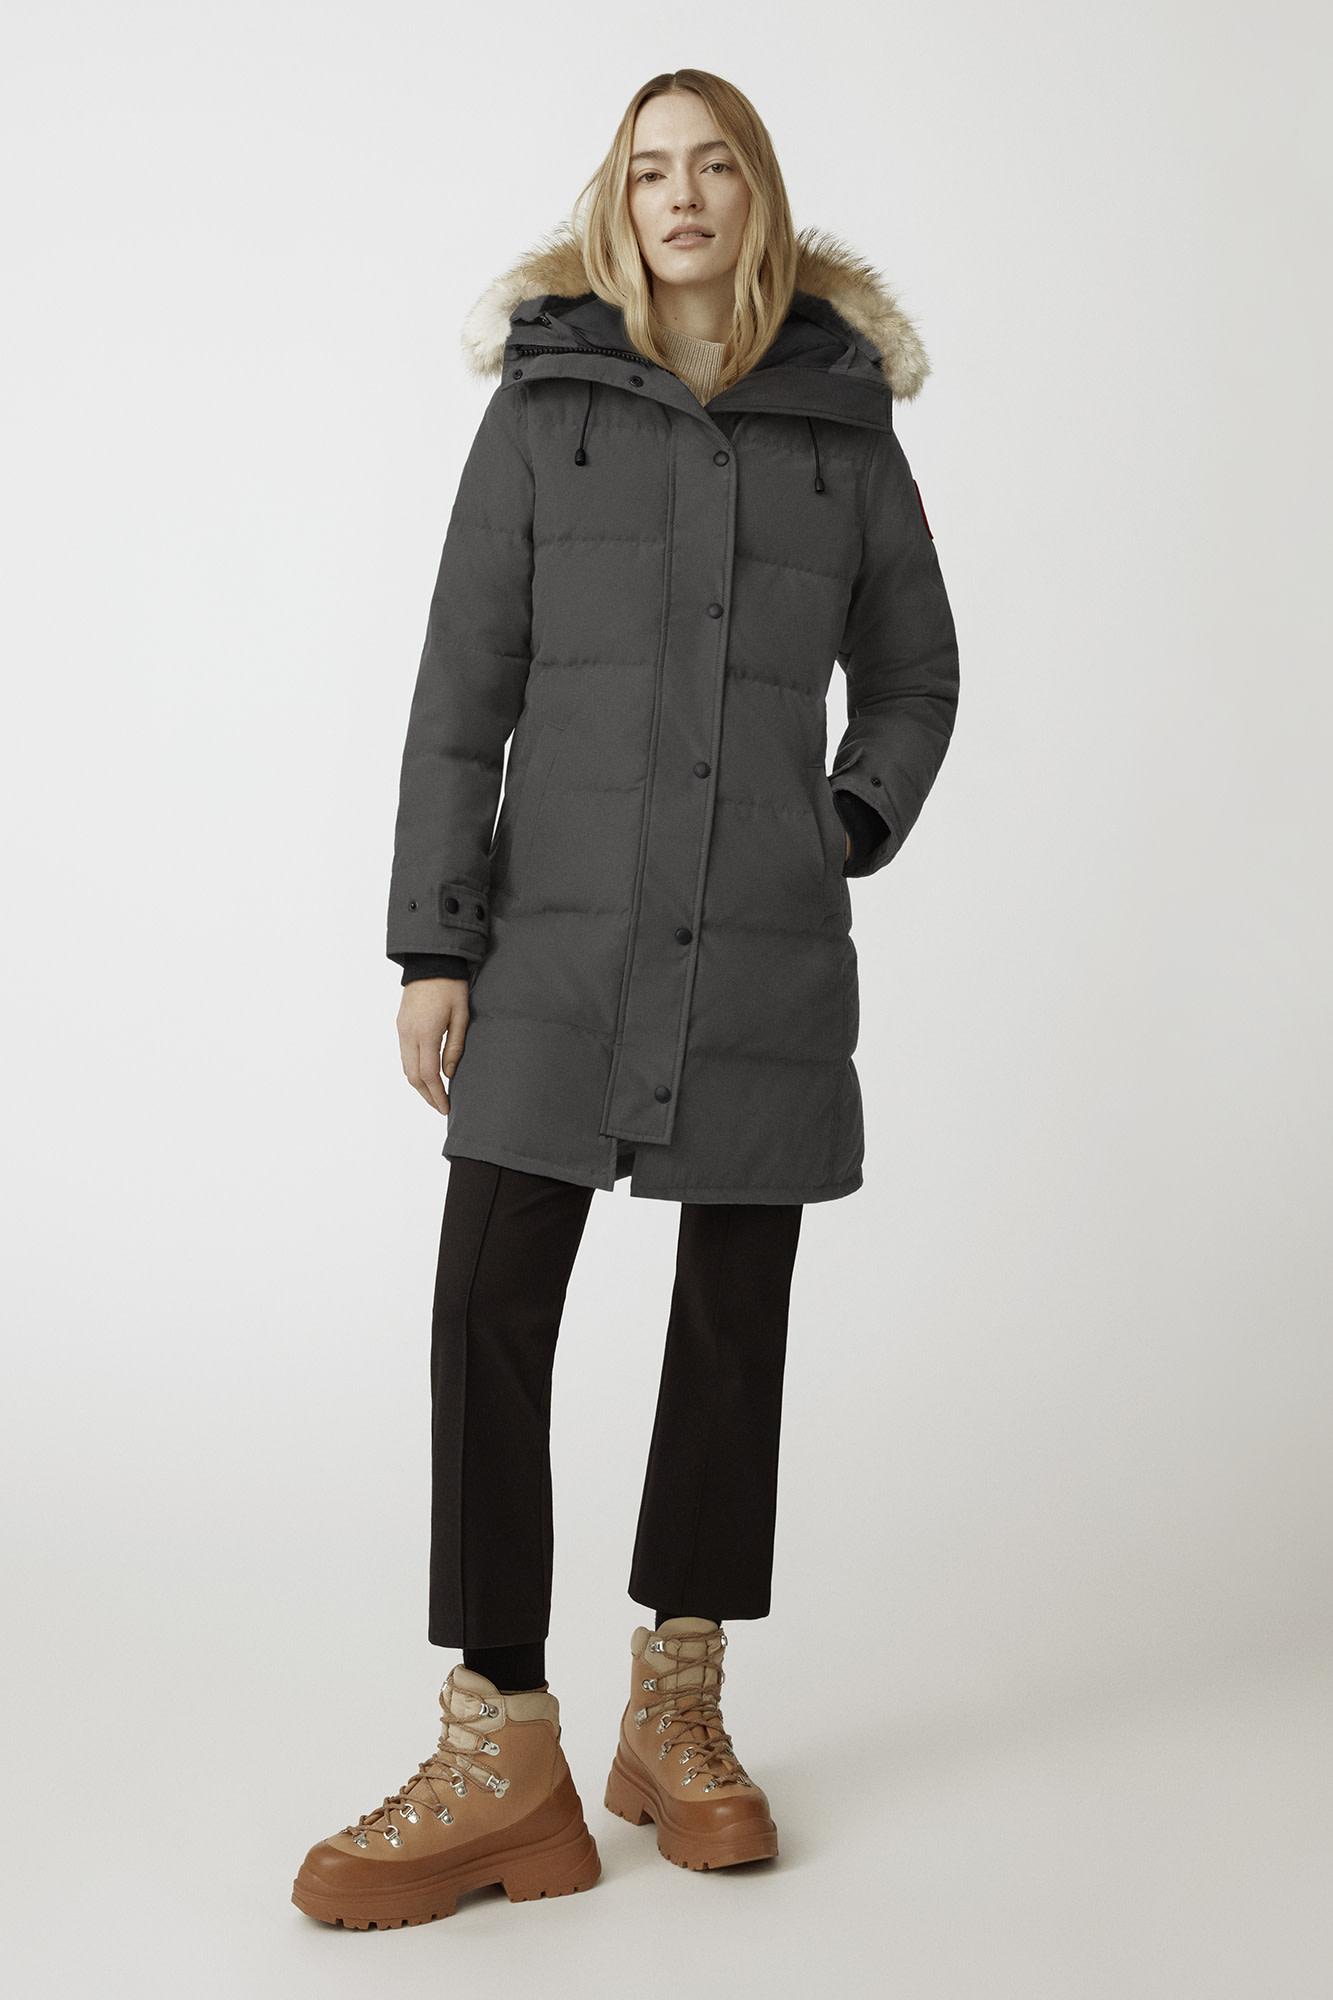 Canada Goose 加拿大鹅 Shelburne 女式派克大衣羽绒服 3802L XS码 8.1折$809.7 海淘转运到手约¥5425 天猫¥9100